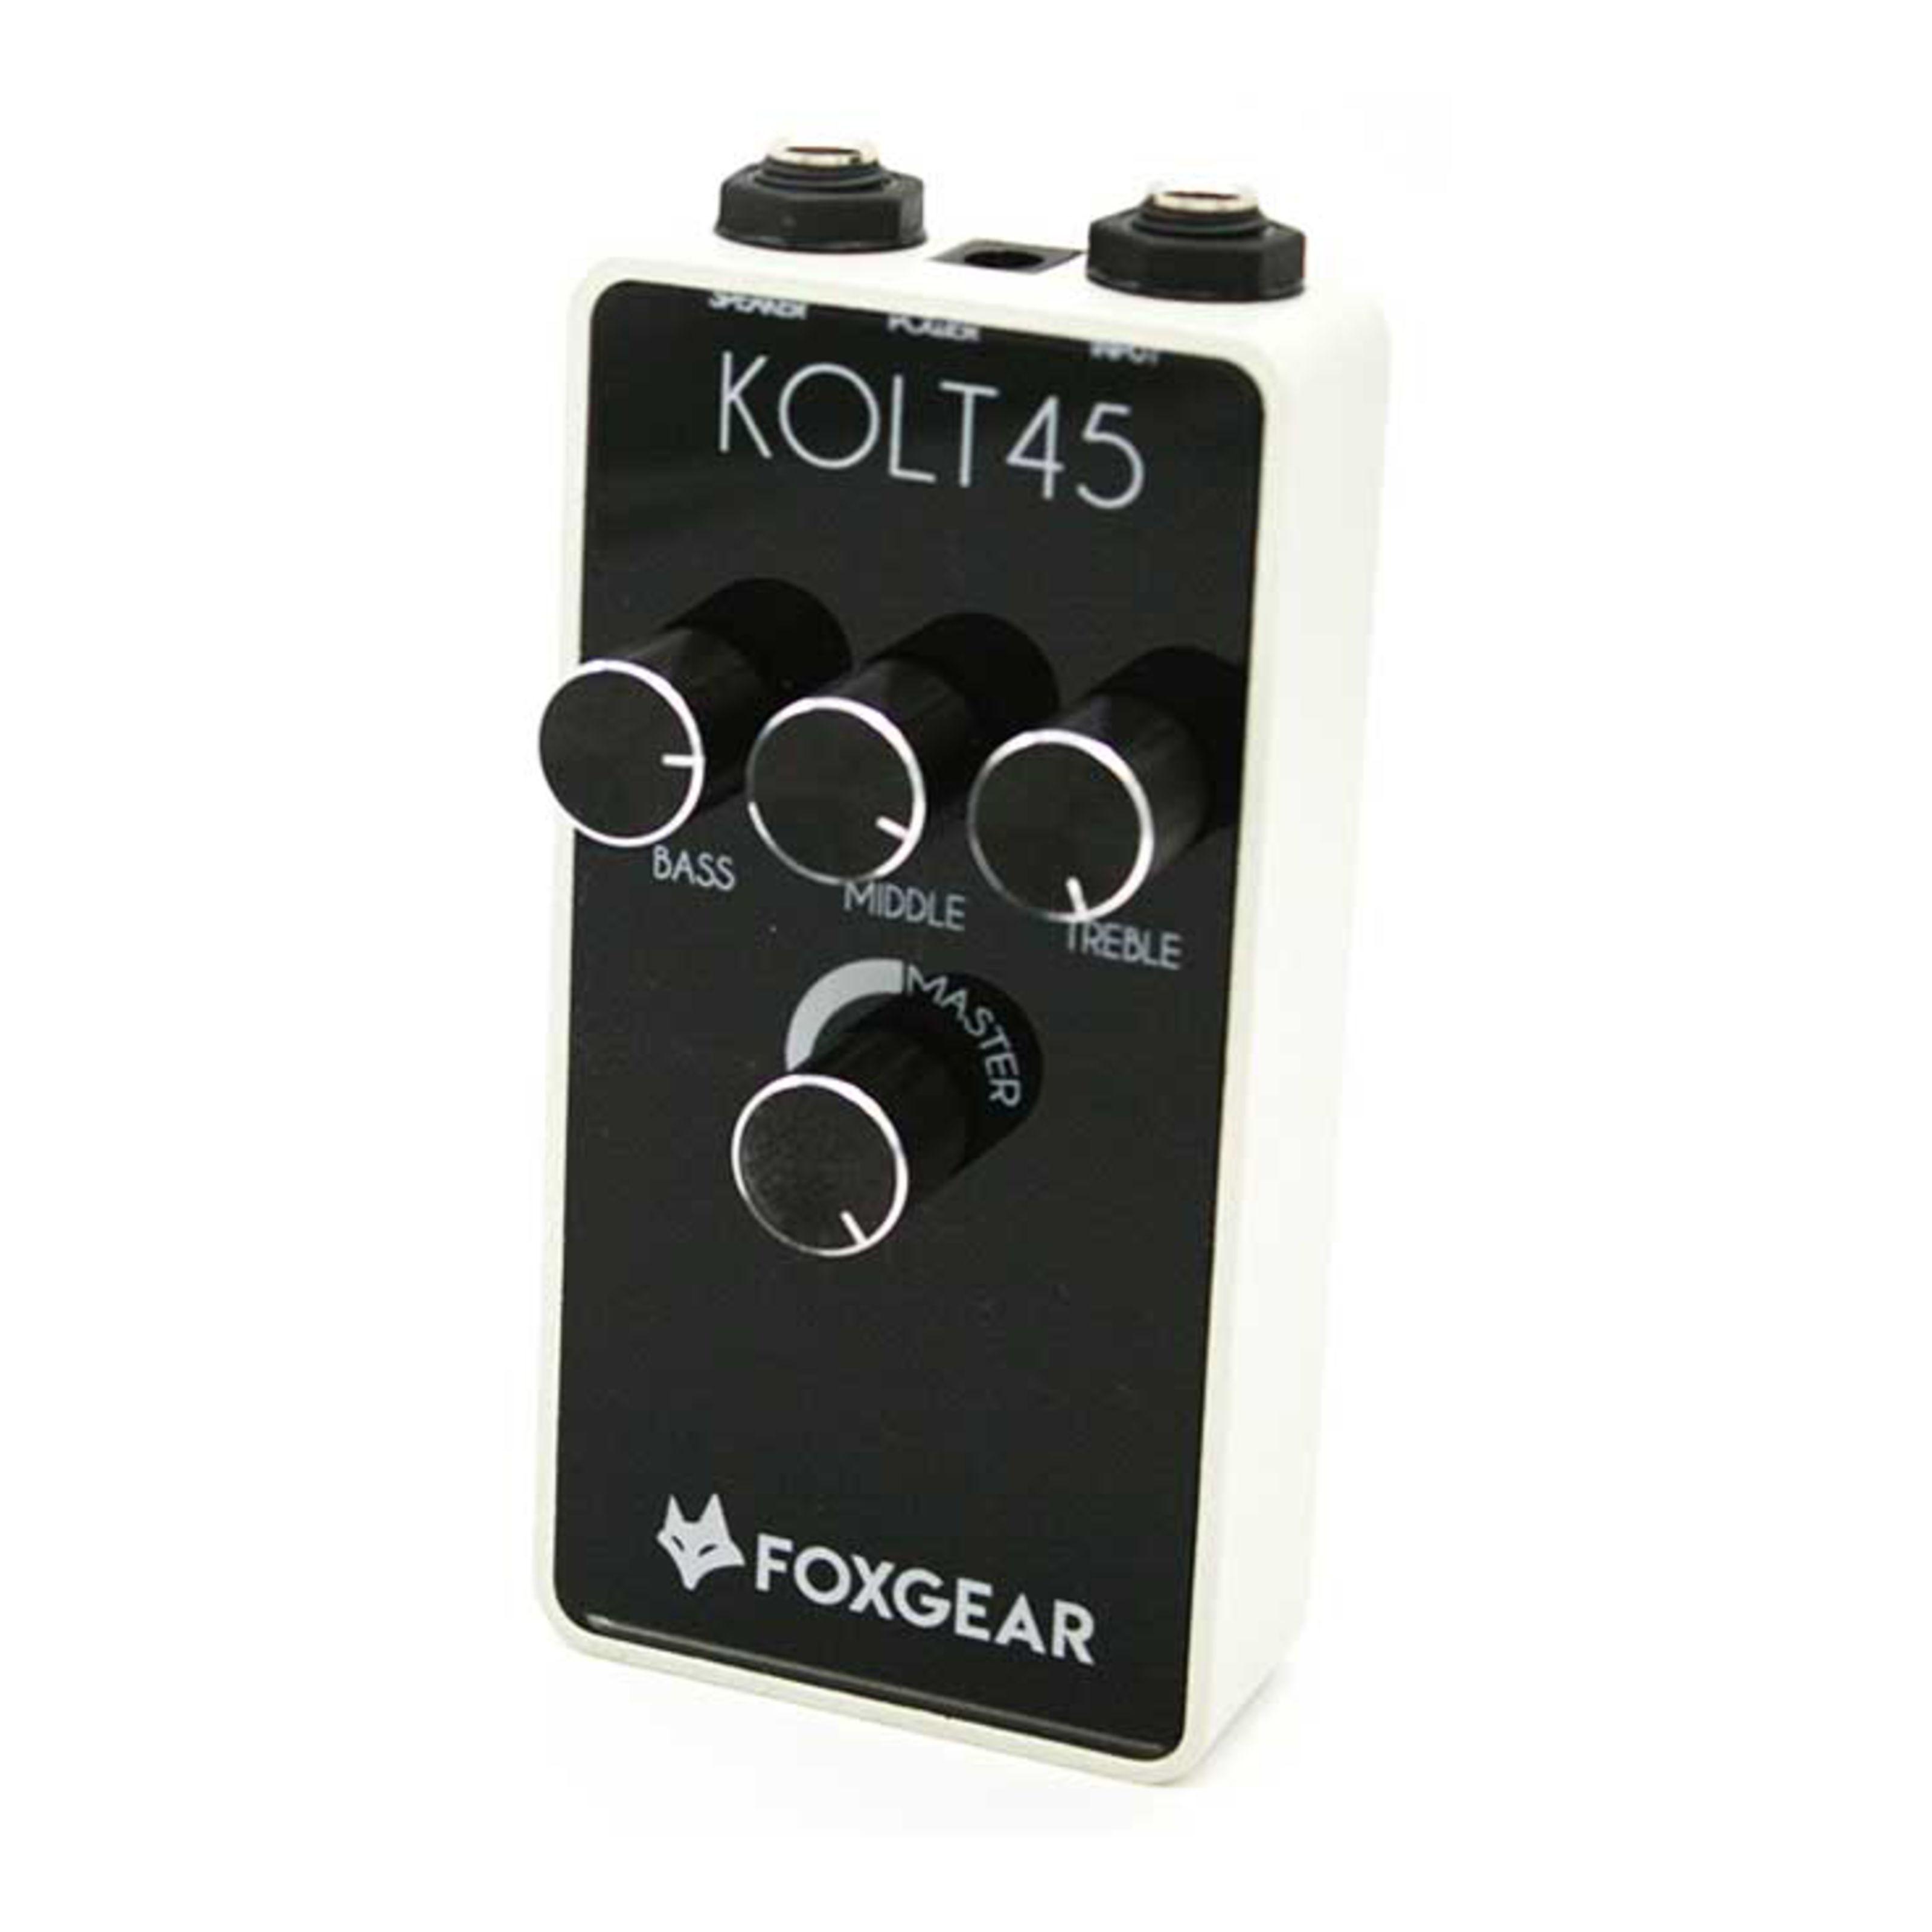 Foxgear - Kolt 45 FGK45